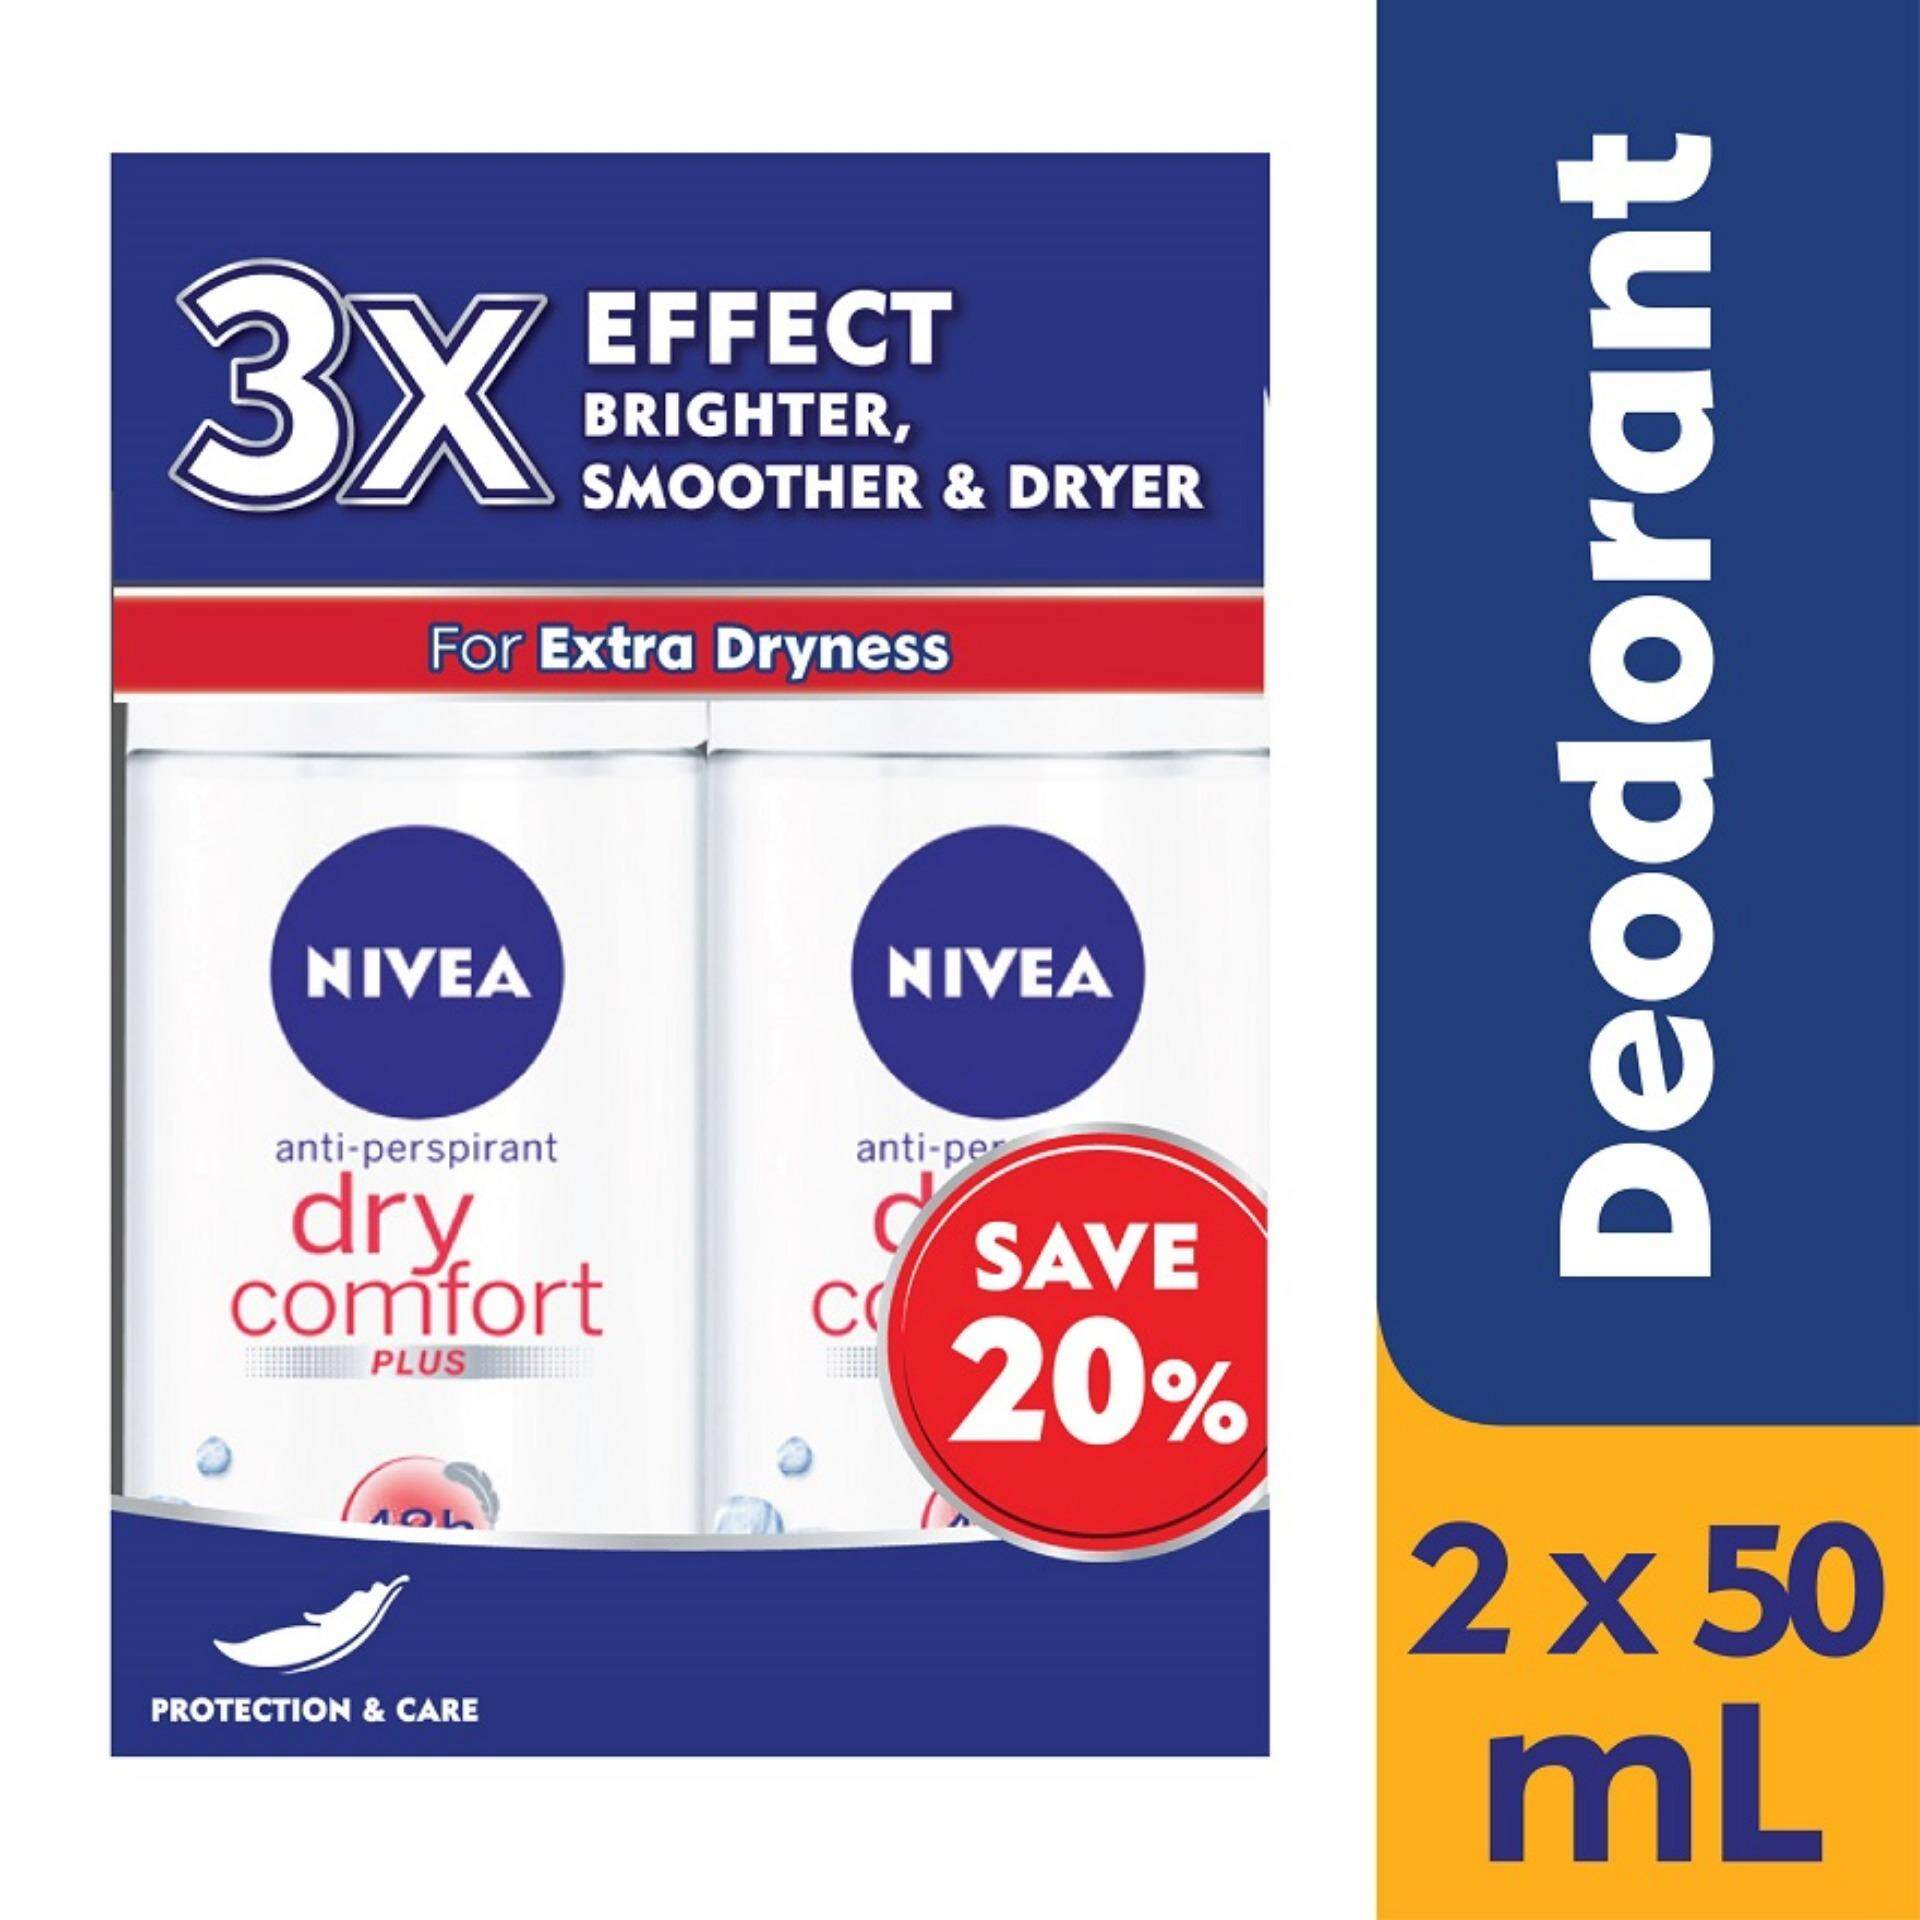 Nivea Personal Care Pleasure Deodorants Price In Malaysia Best Men Deodorant Dry Impact Roll On 50ml Comfort Twin Pack 2x50ml